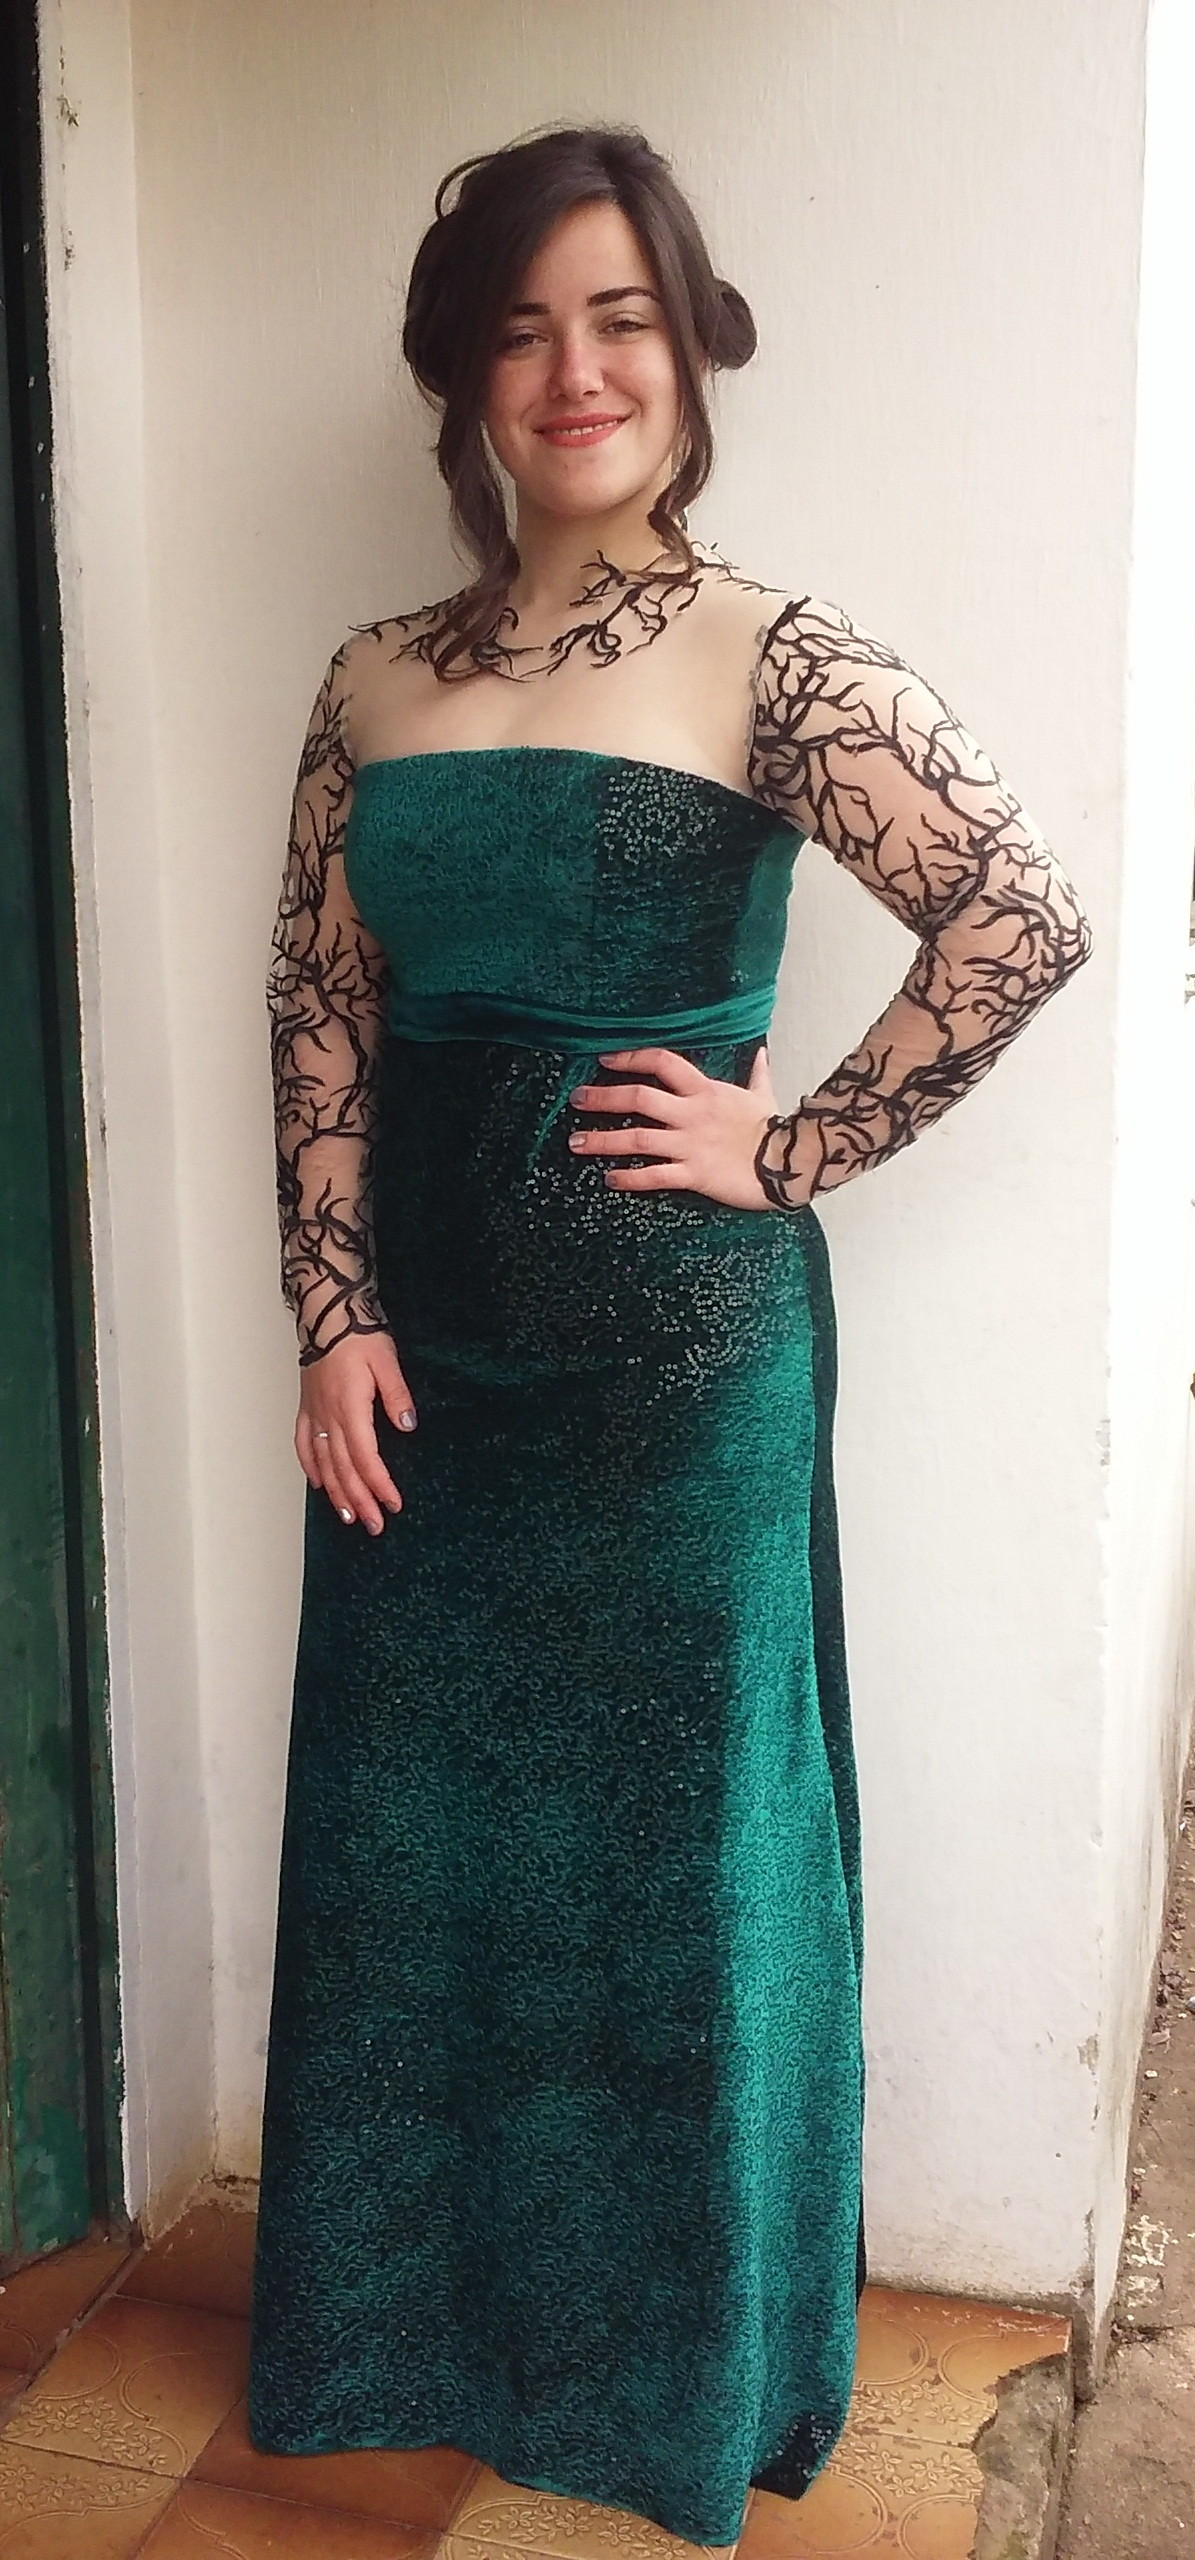 Sonhar com vestido longo verde